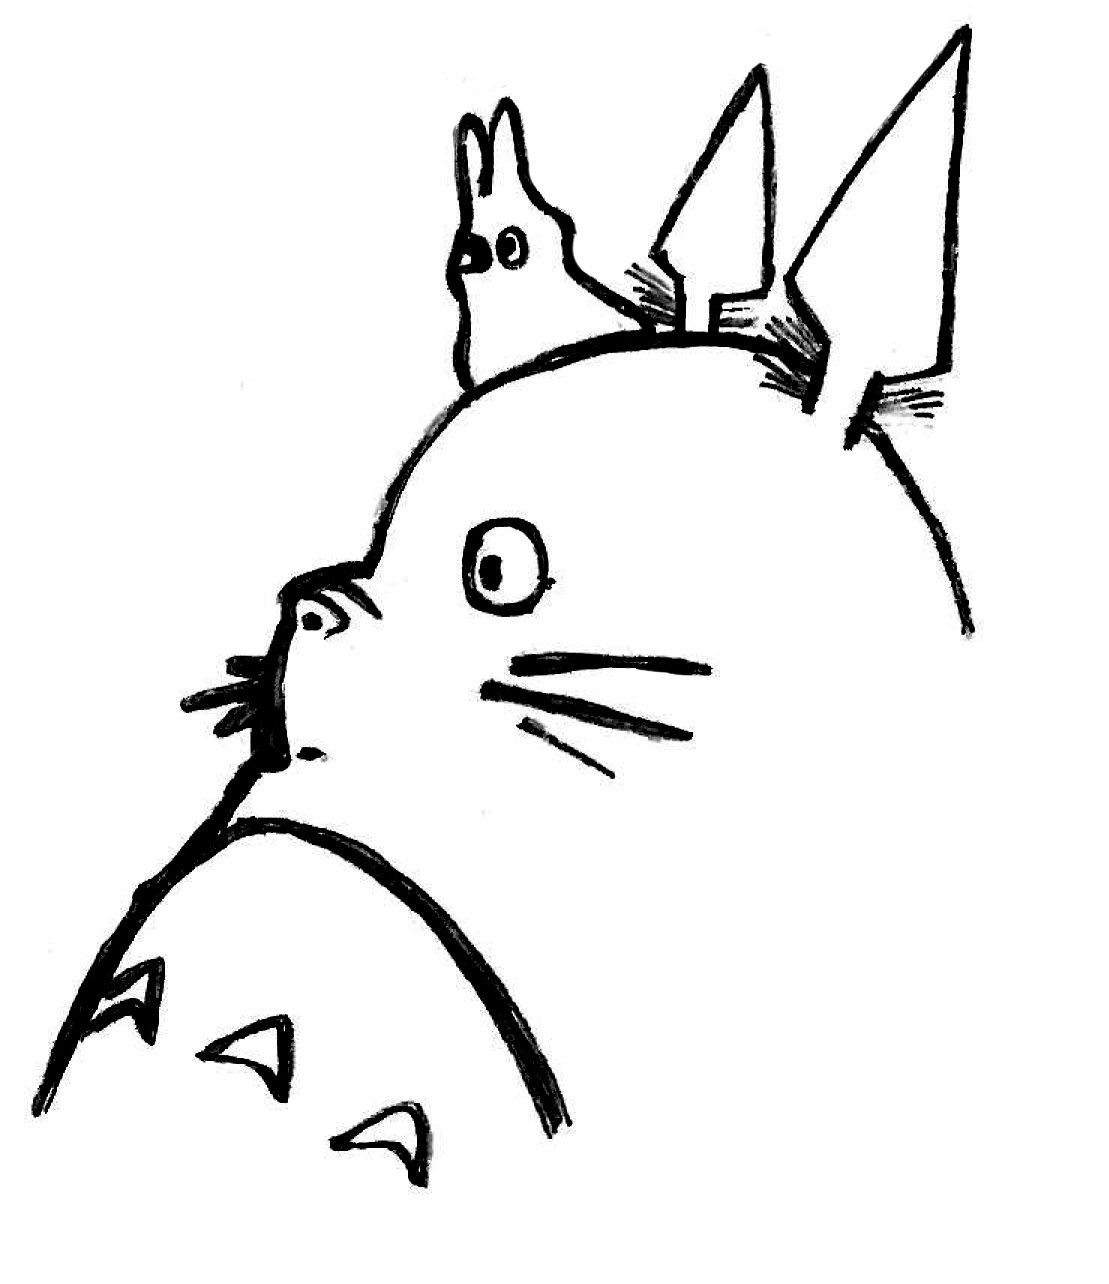 Studio_Ghibli_Logos_By_Sharkn06-D4Ff1Bo.jpg